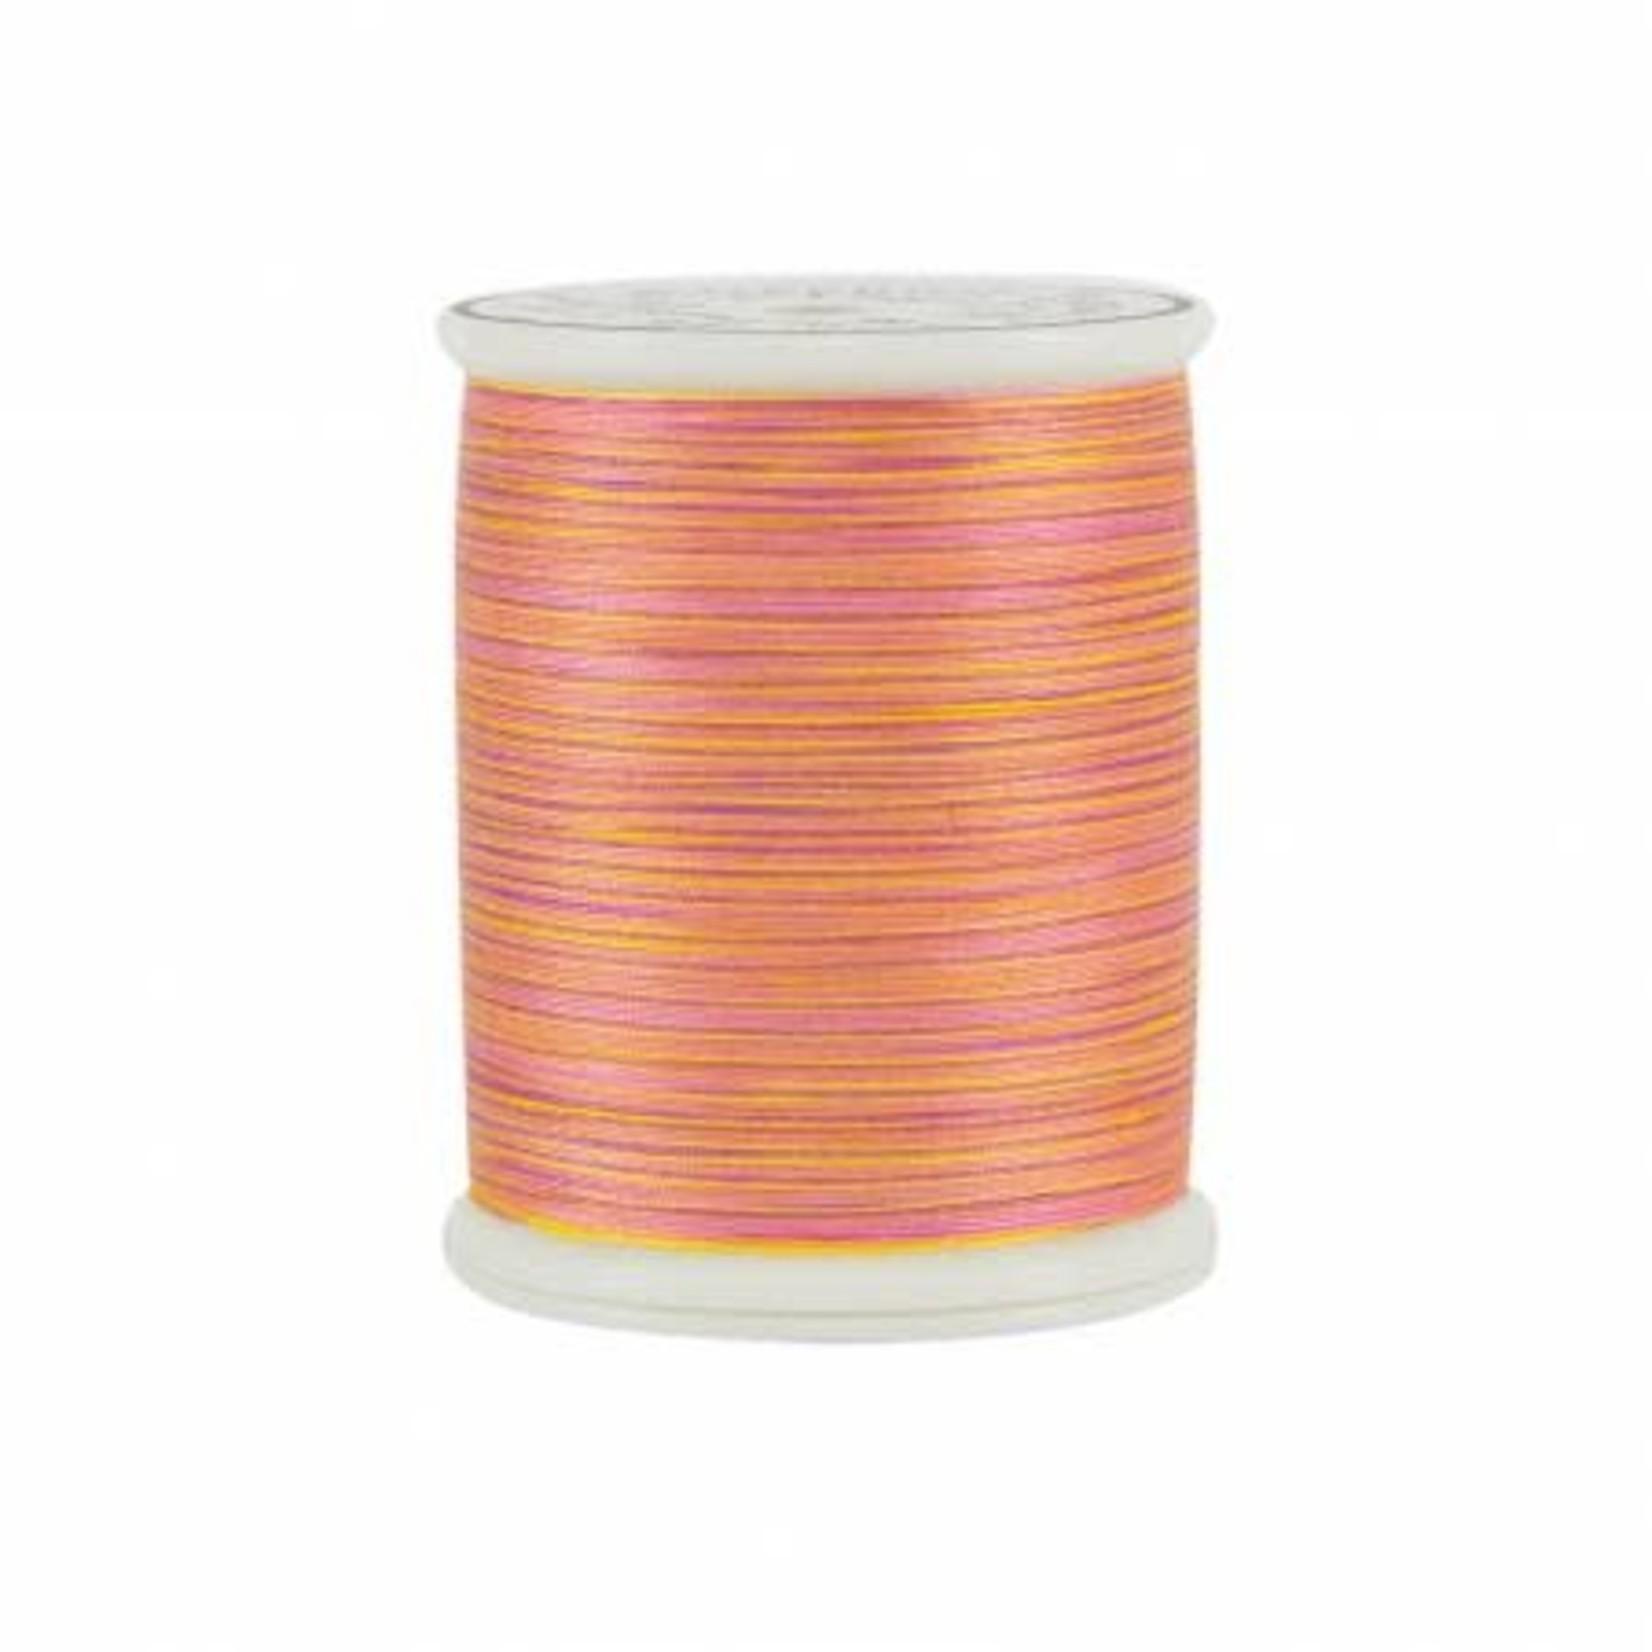 Superior Threads King Tut - #40 - 457 m - 0922 Harem